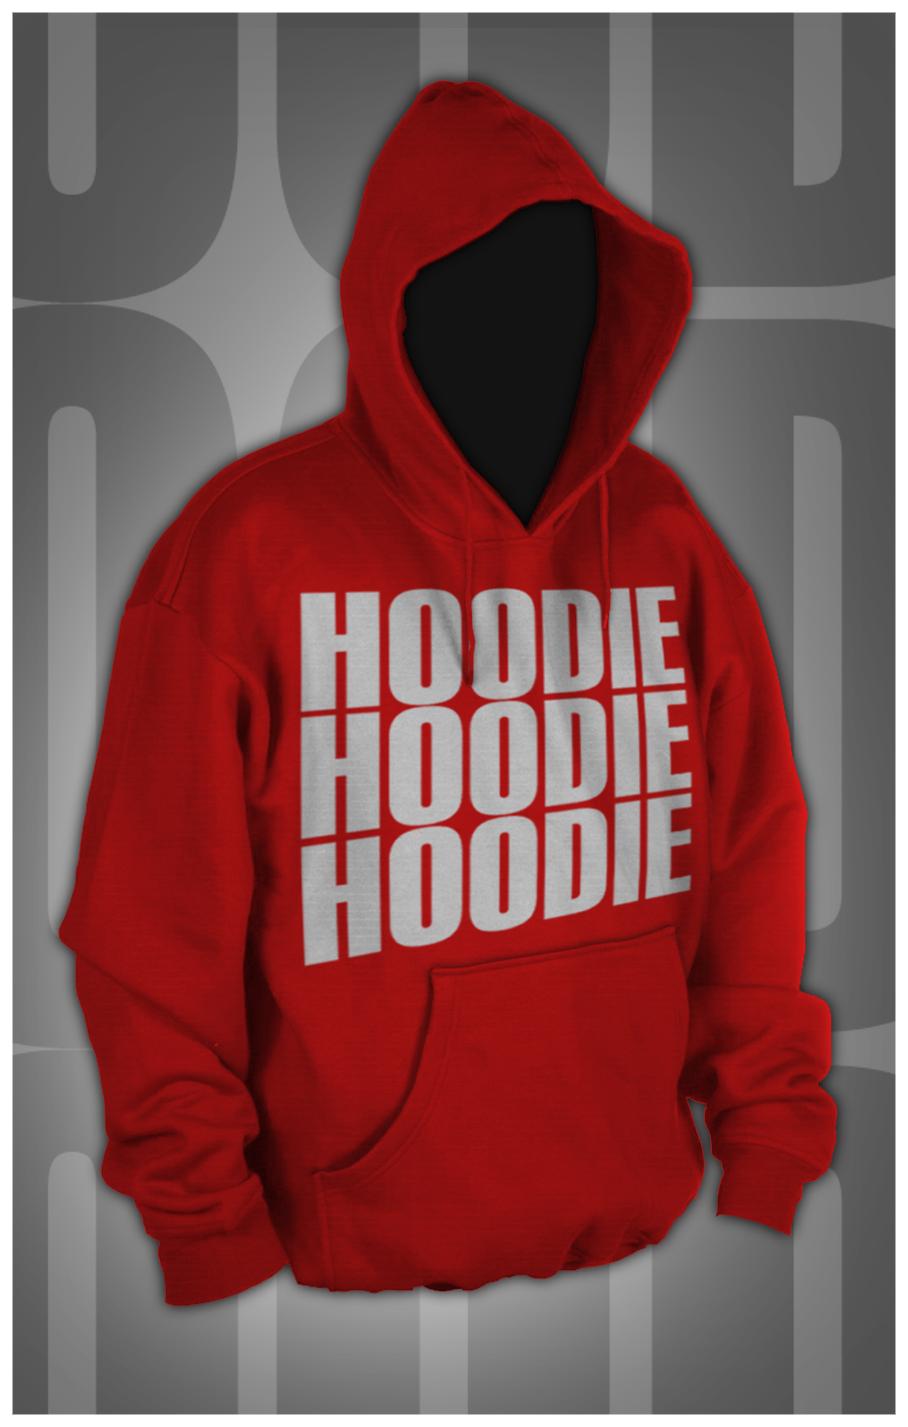 Hoodie Template - no zipper